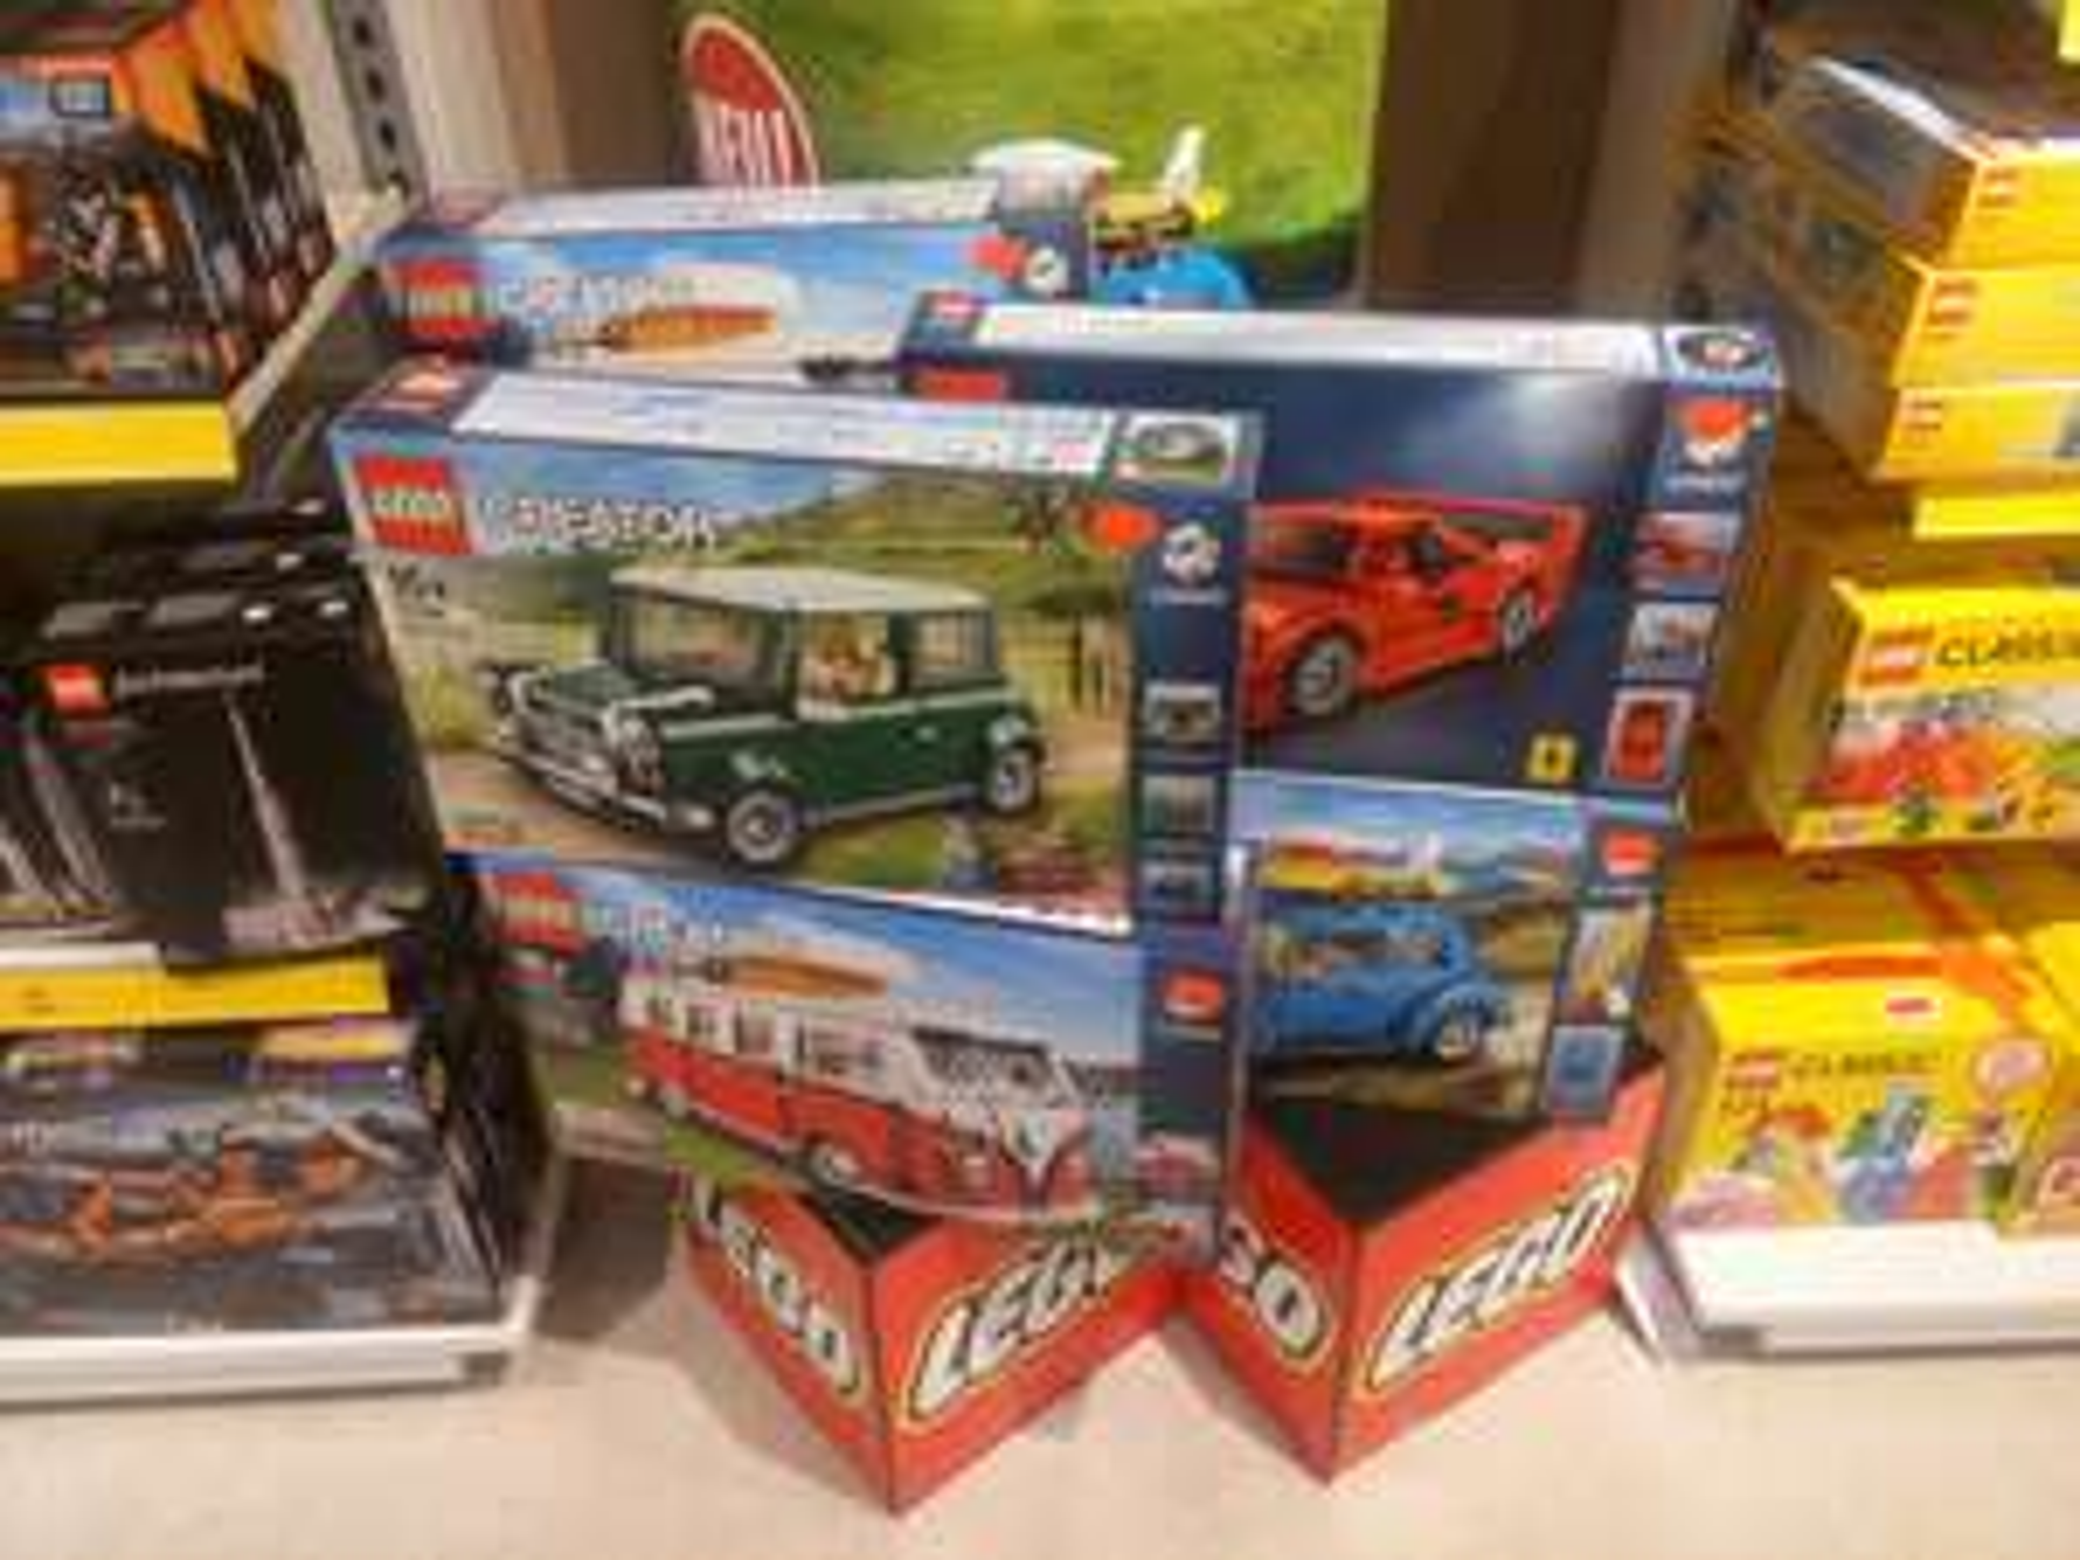 [lokal 41539] Lego Creator Ferrari F40 10248 günstig - auch Mini Cooper 10242, VW Bulli 10220 Käfer 10253 Preise ok